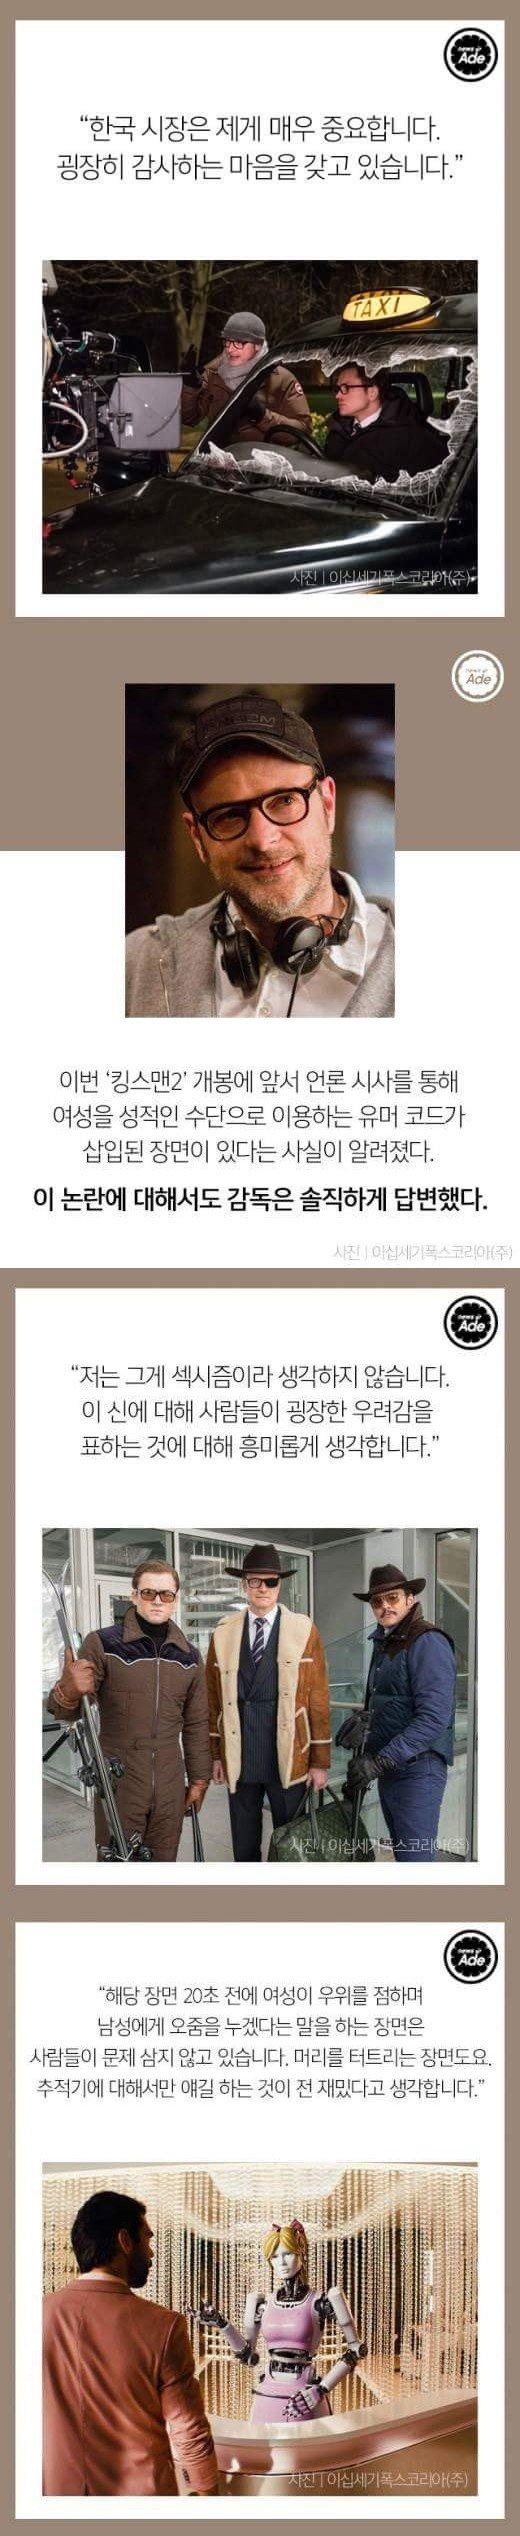 1507365706.jpg 킹스맨2 여혐논란 감독반응